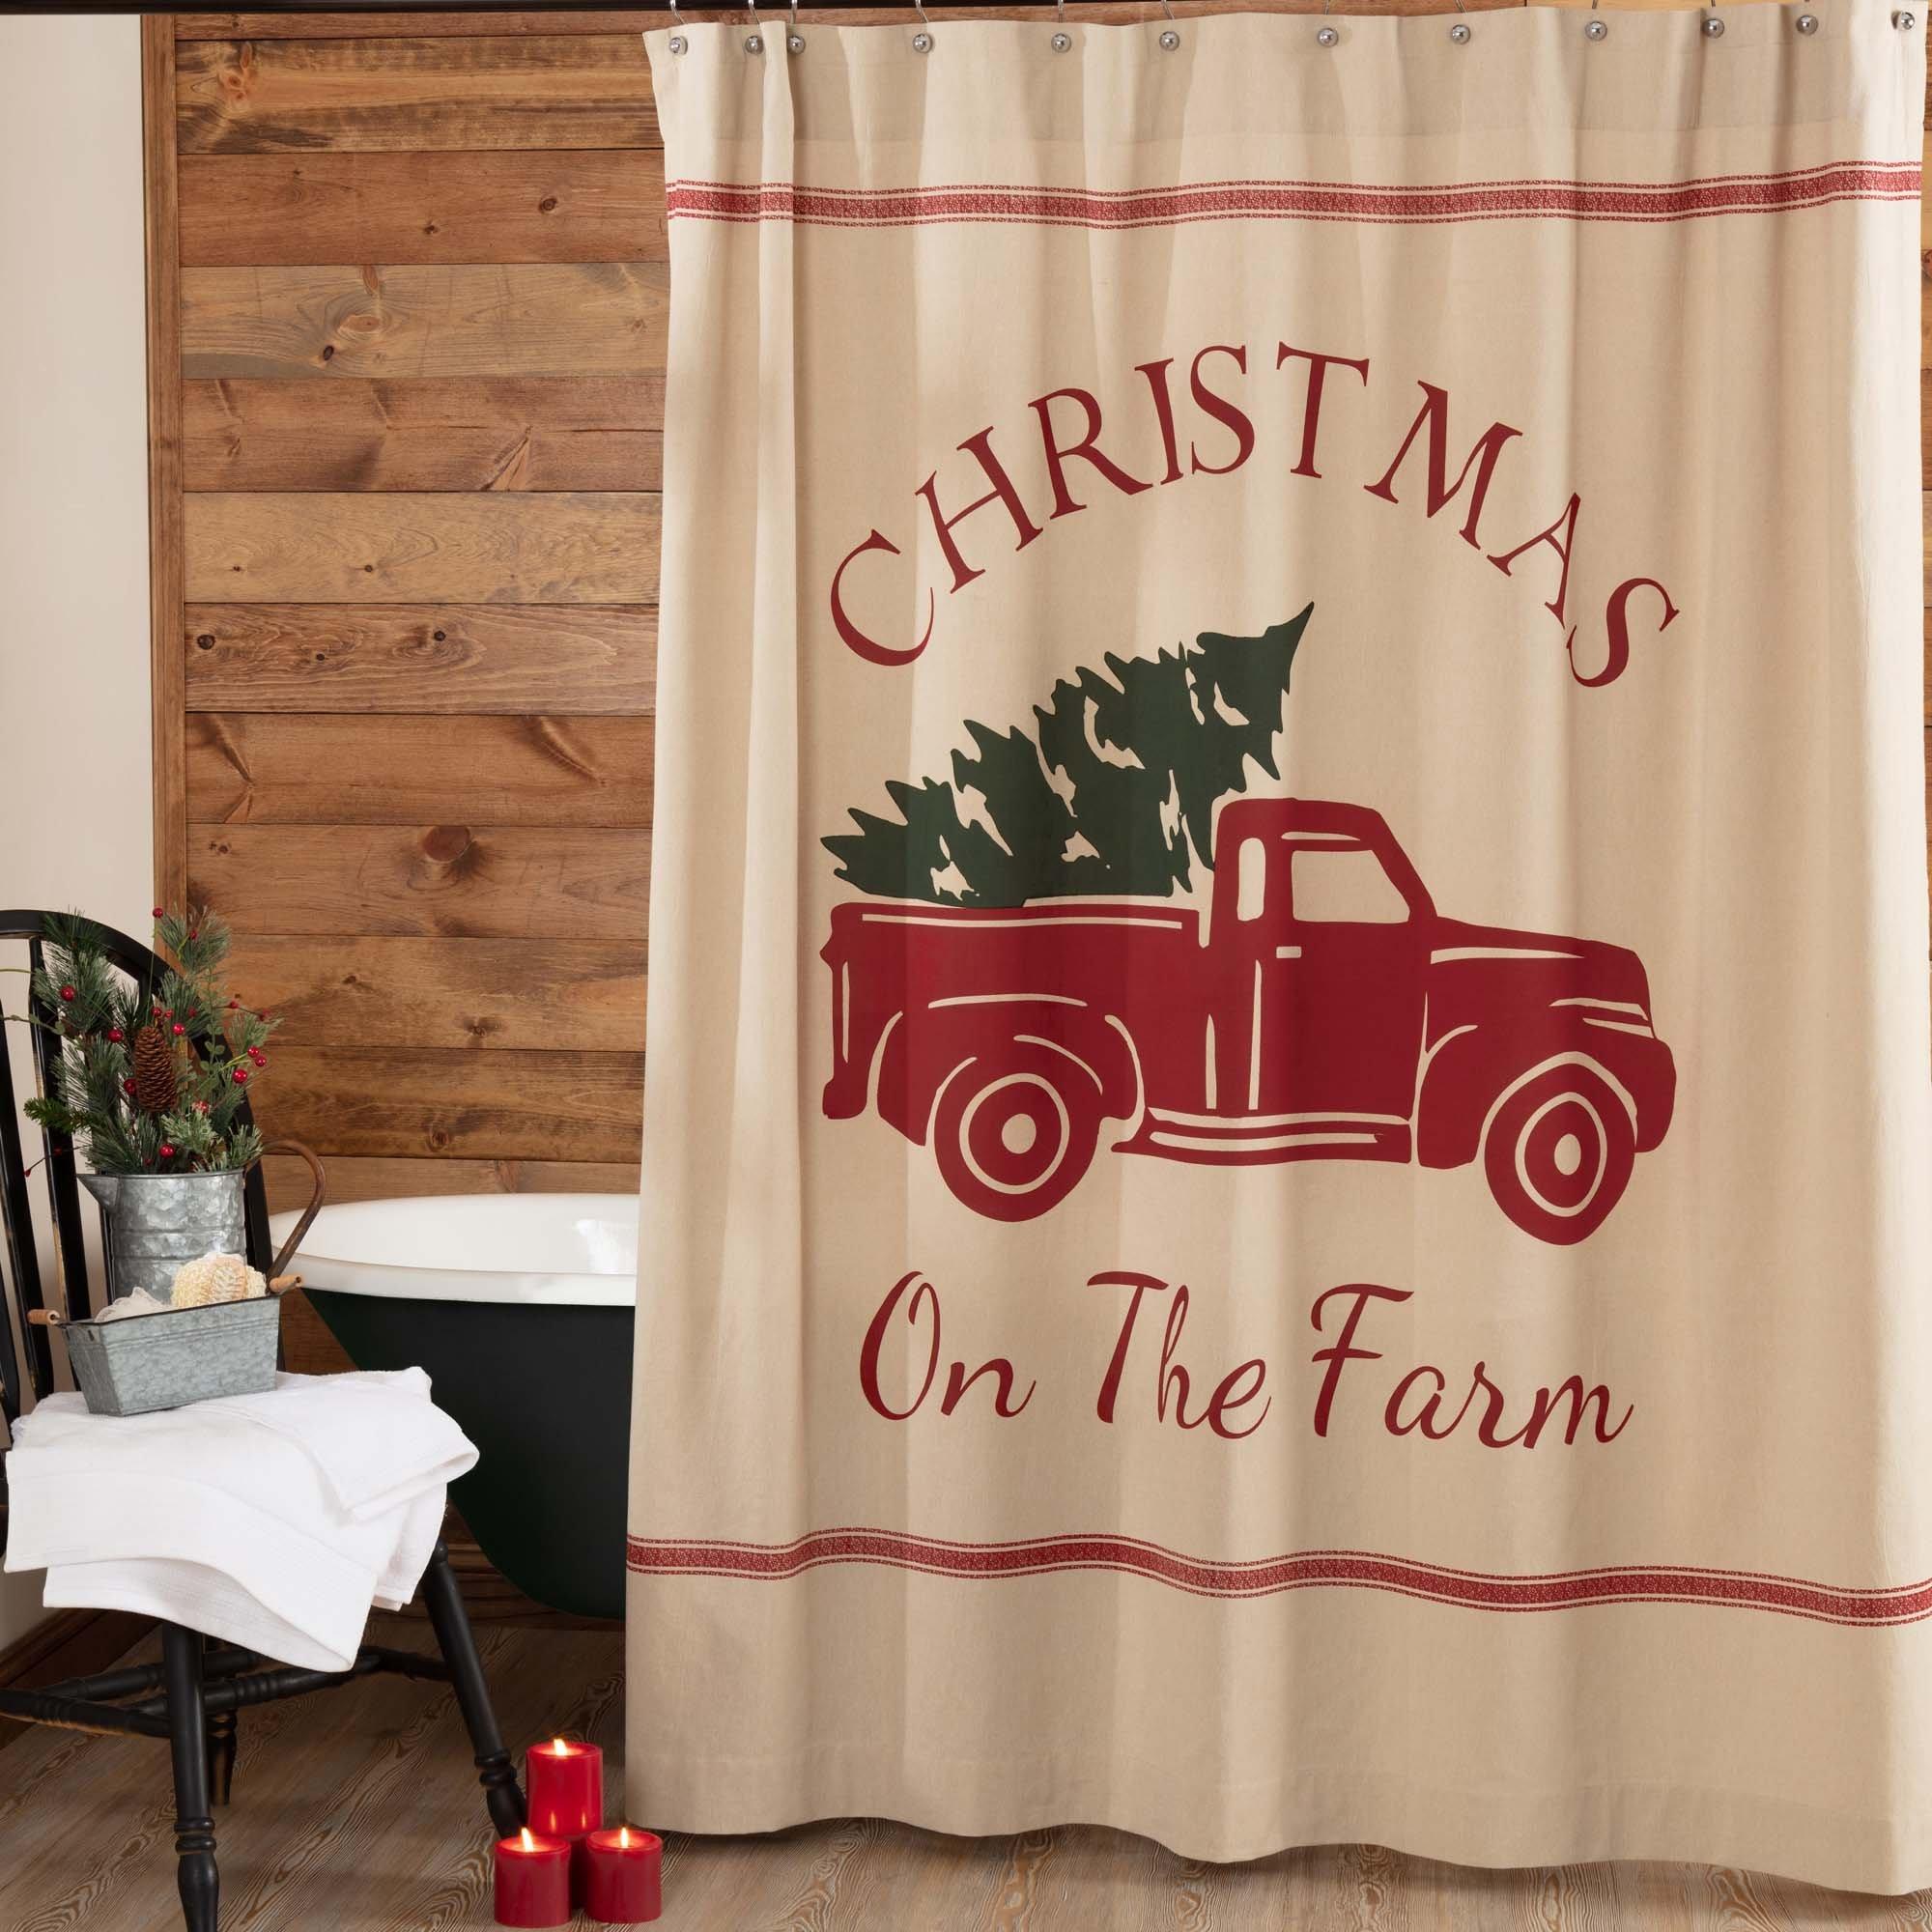 Piper Classics Christmas Tree Farm Shower Curtain, 72'' x 72'', Red Truck Country Farmhouse Holiday Bathroom Décor